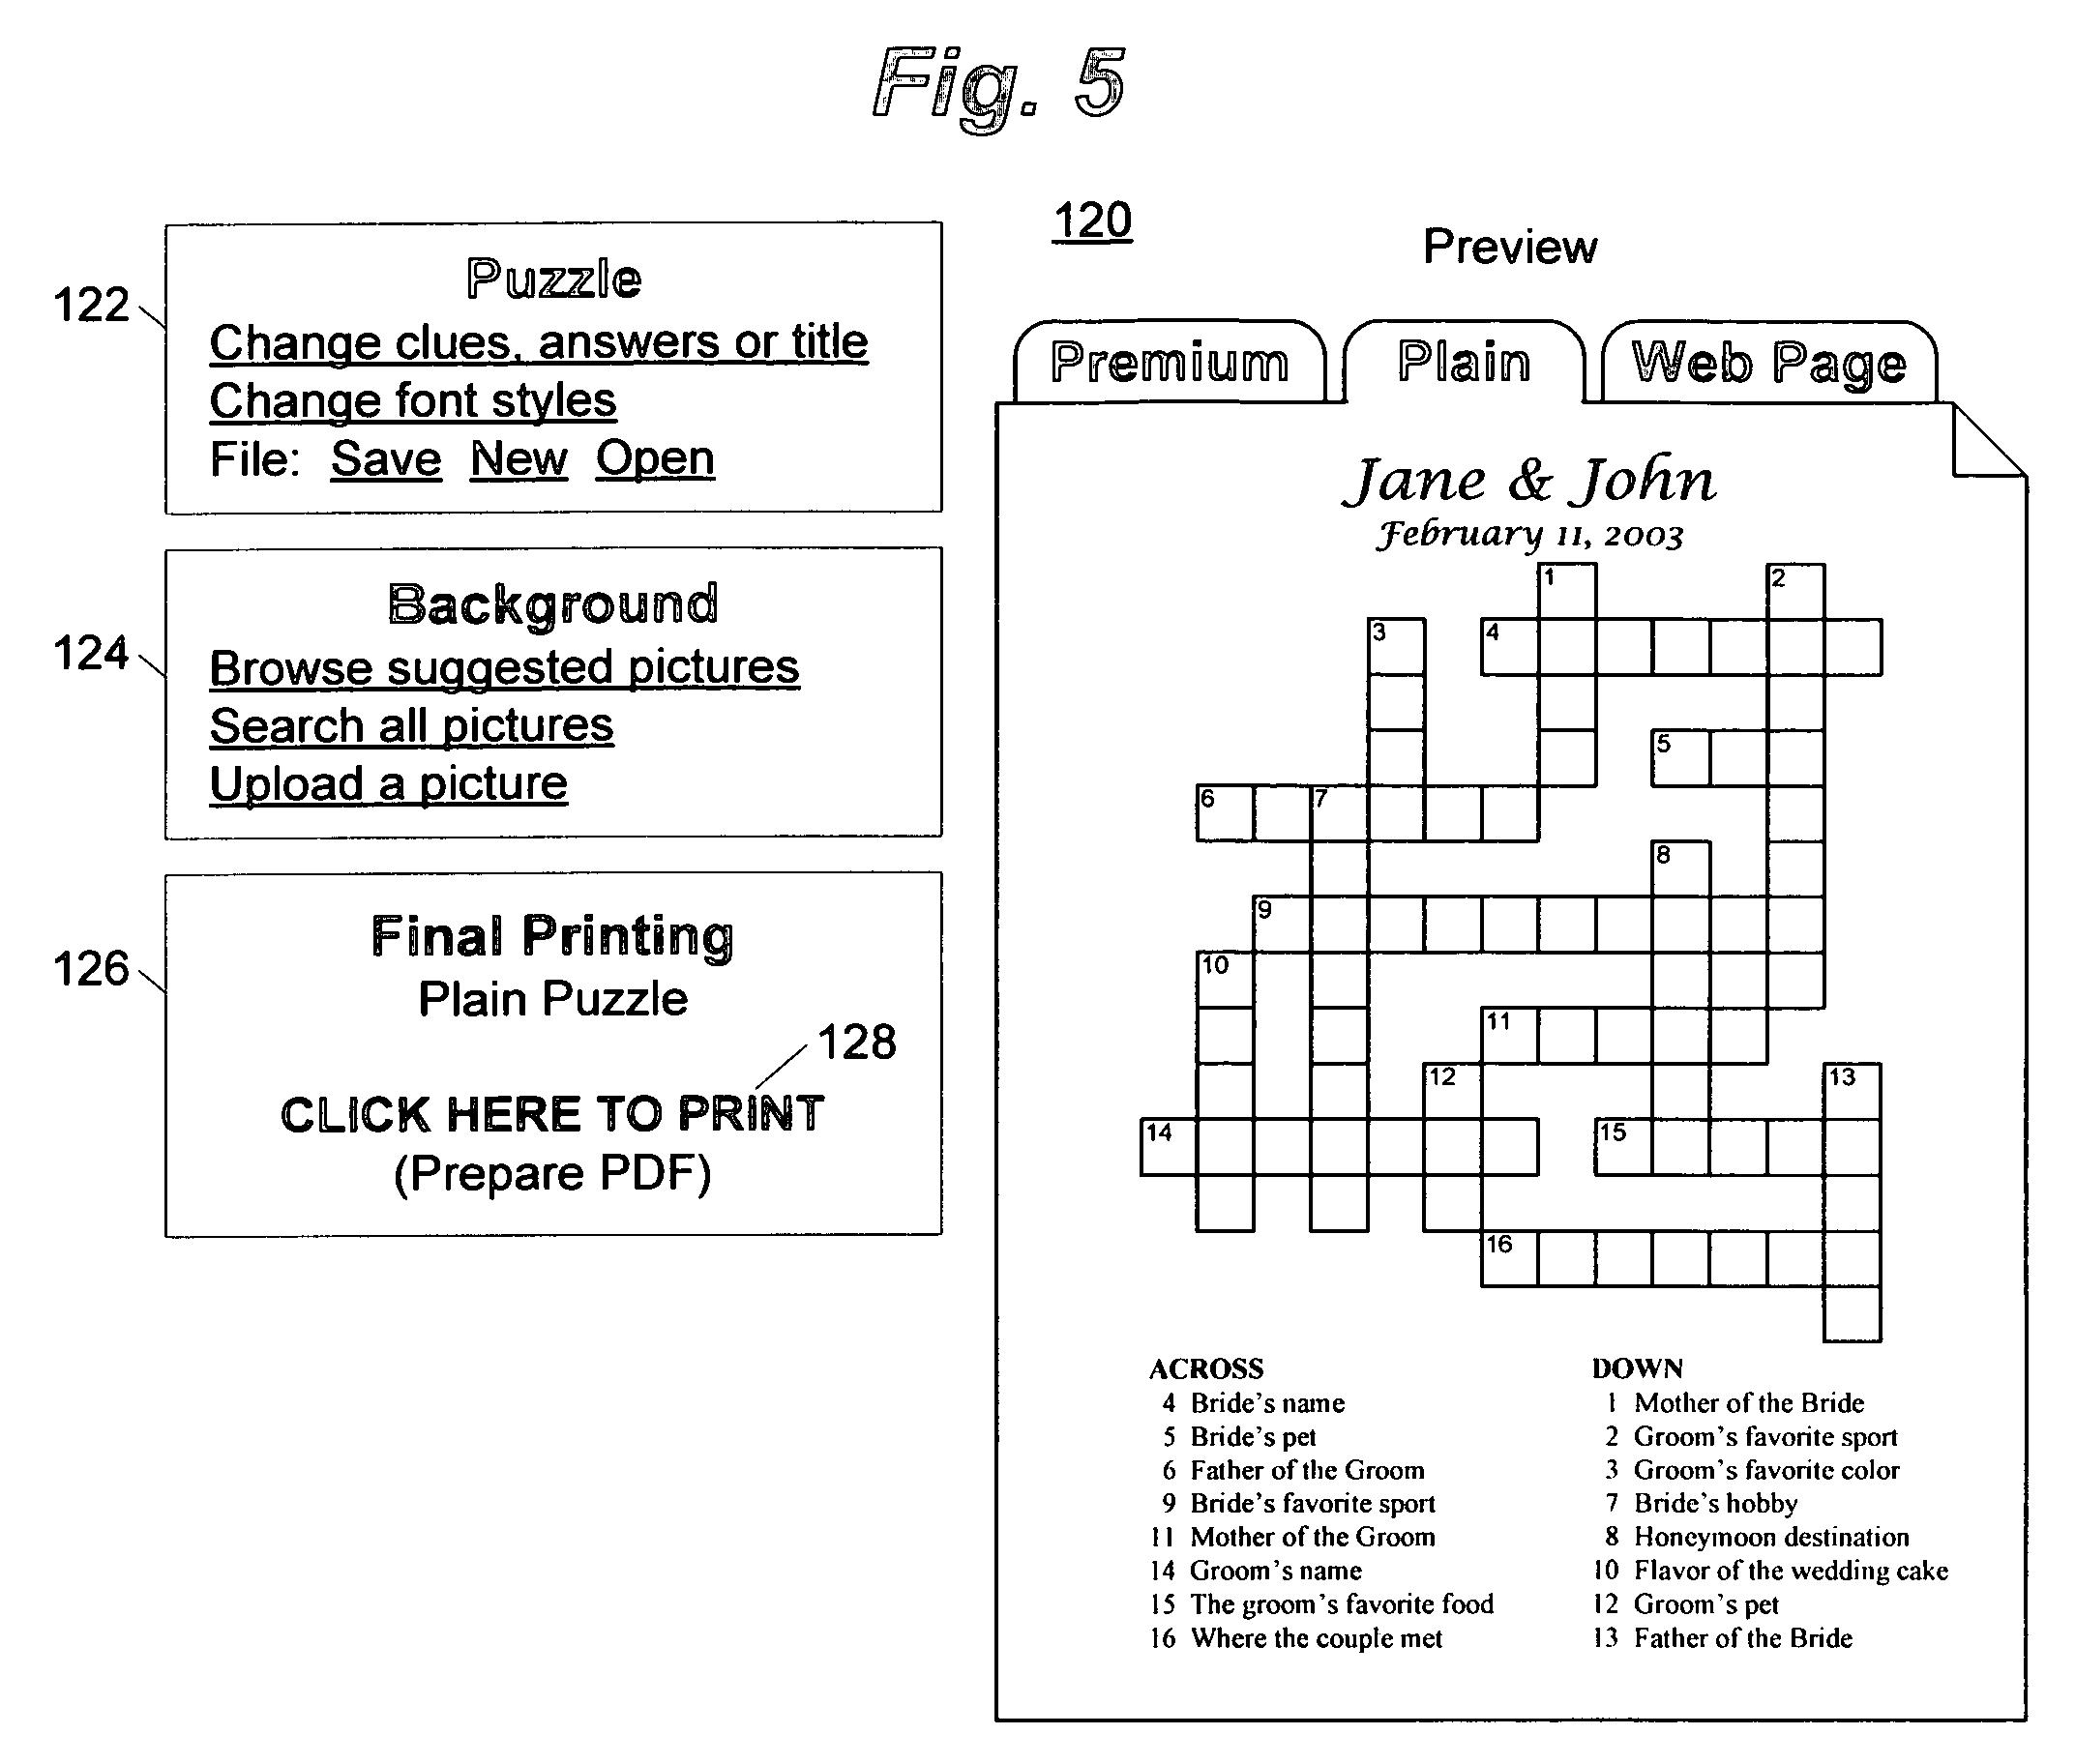 Dissertation Paper Crossword Clue